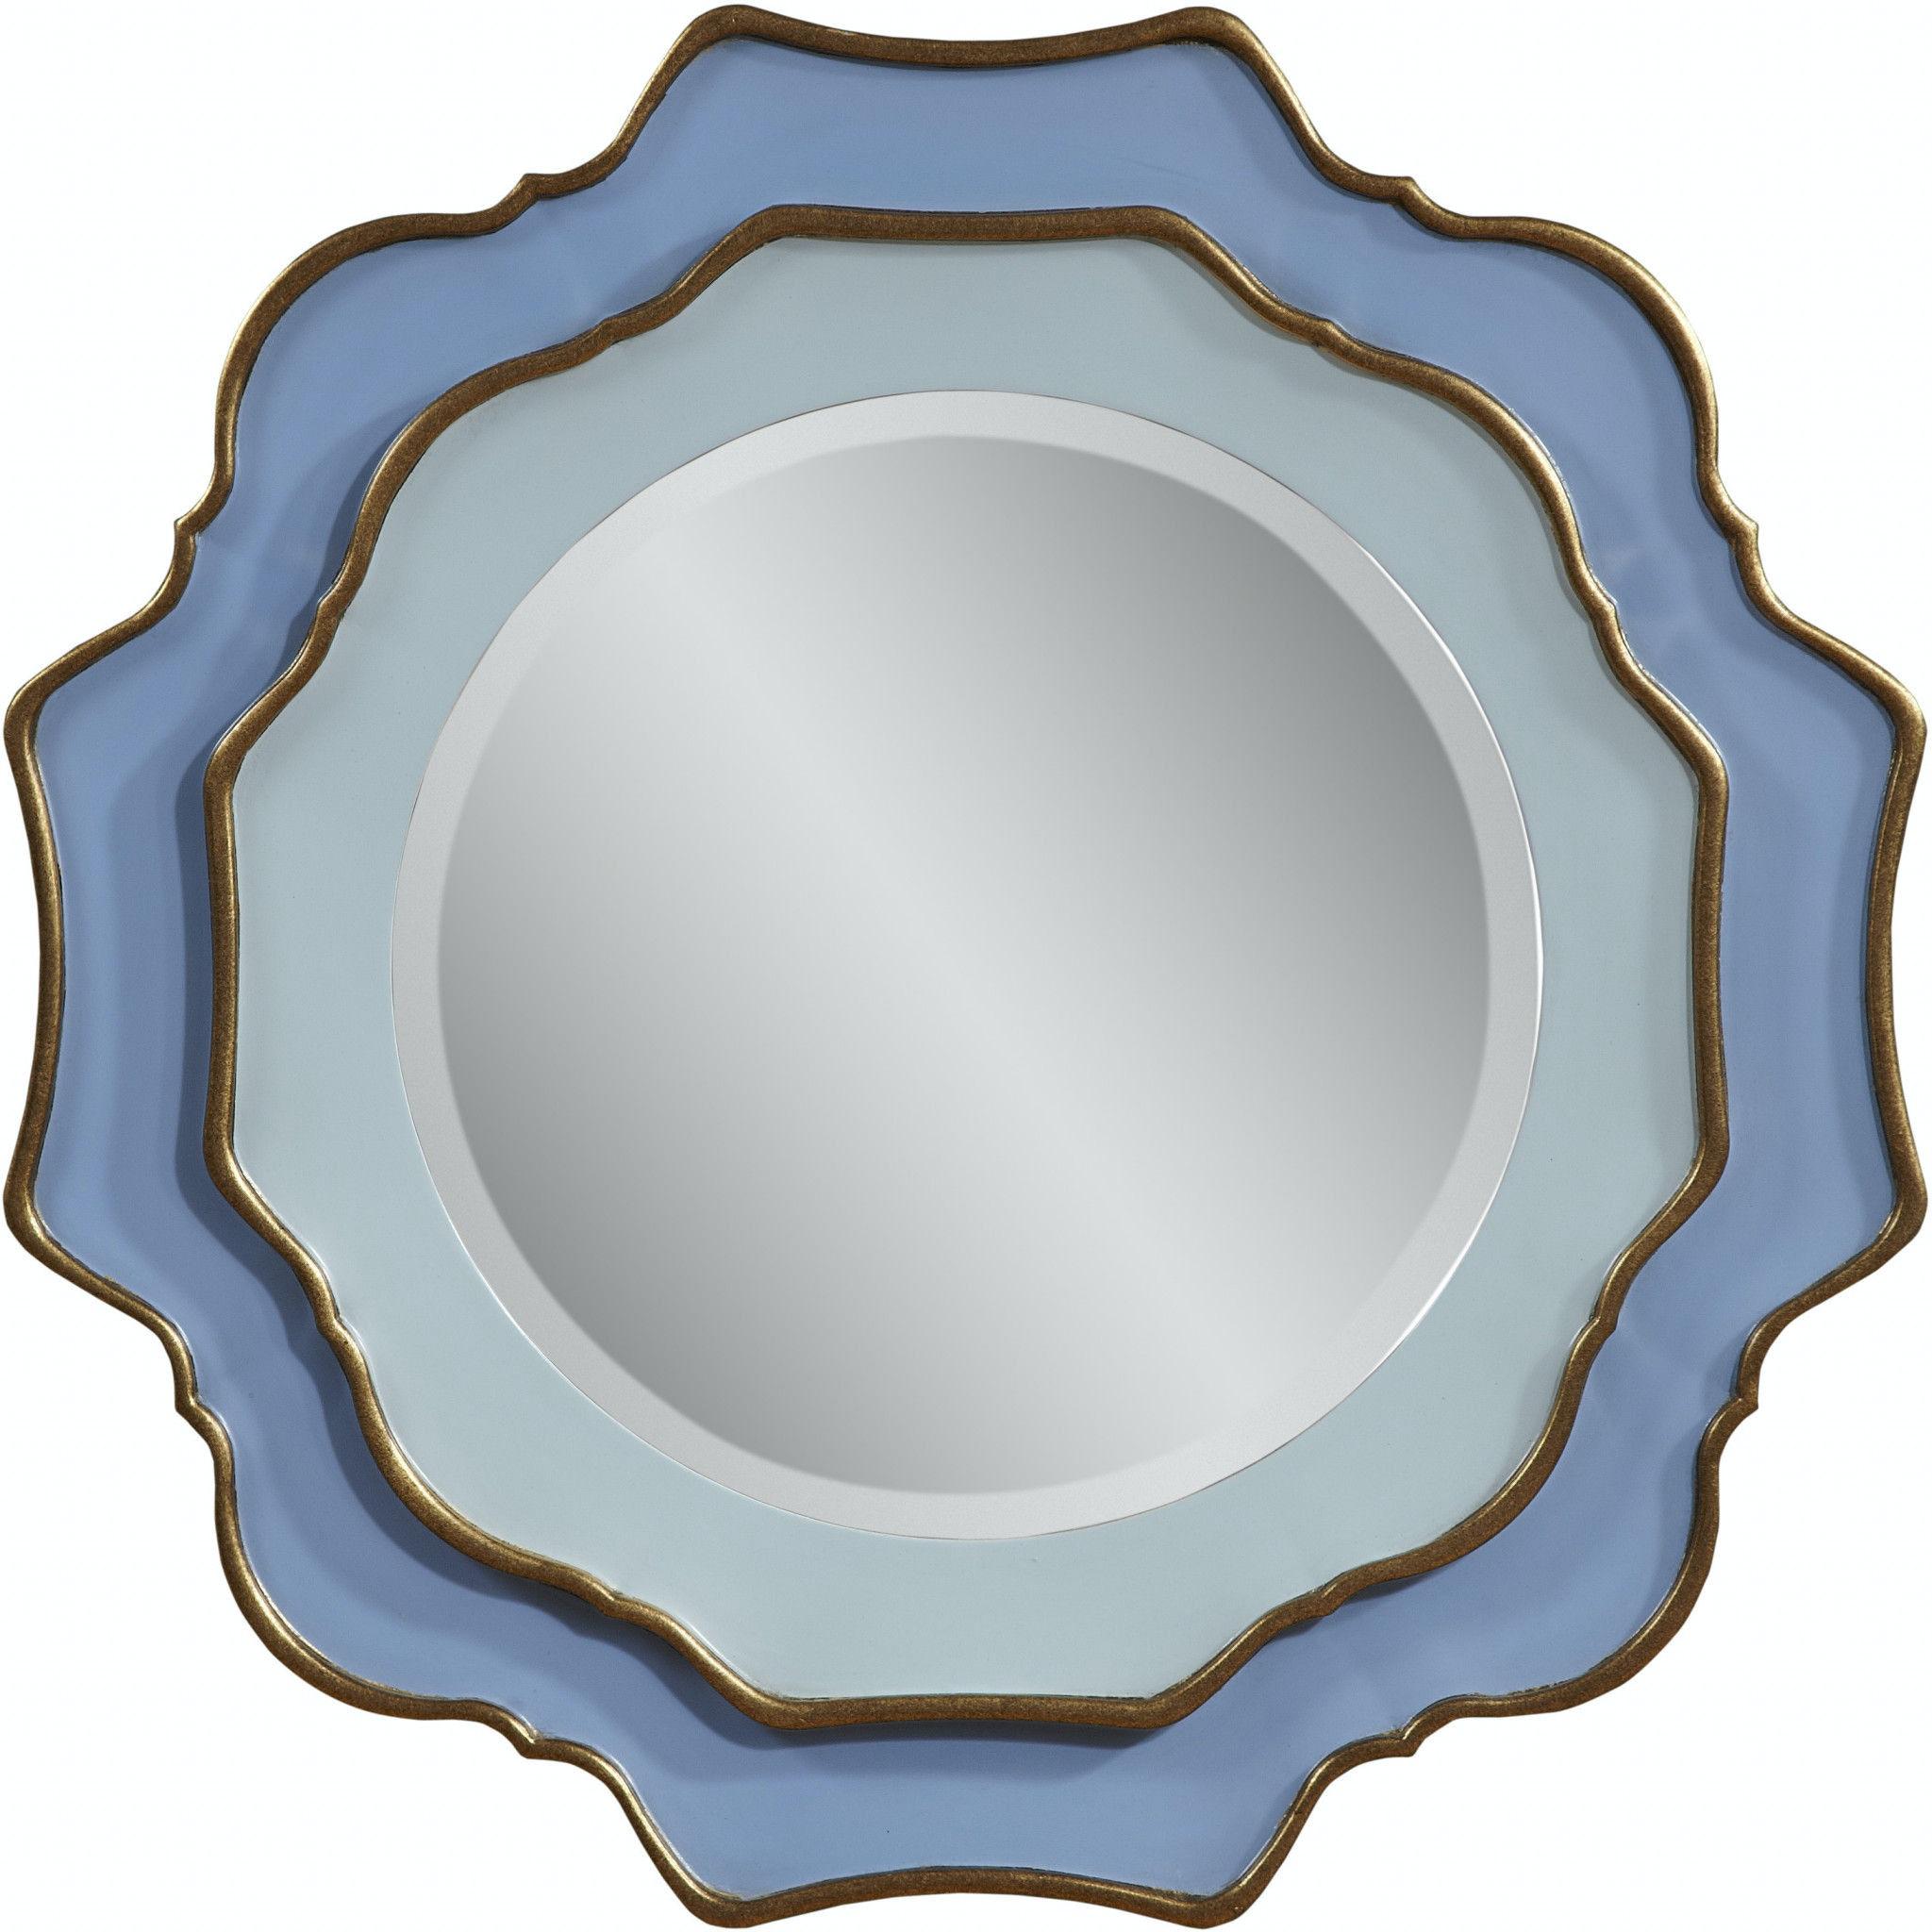 Bassett Mirror Company Accessories Caprice Wall Mirror